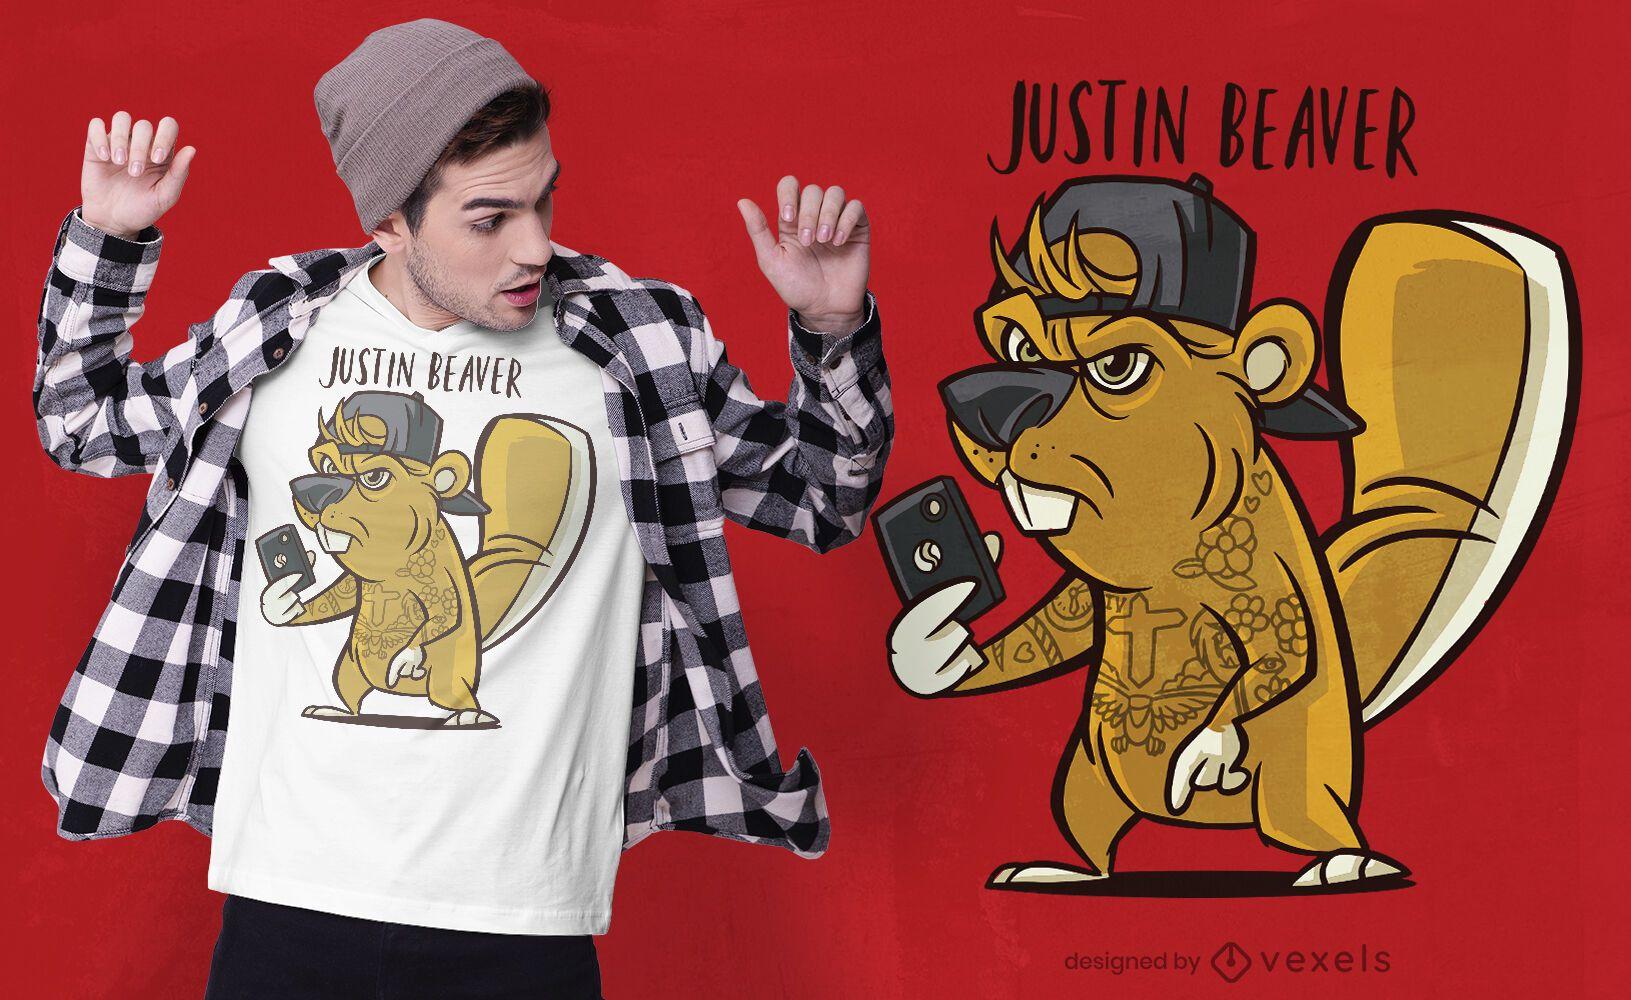 Justin beaver t-shirt design